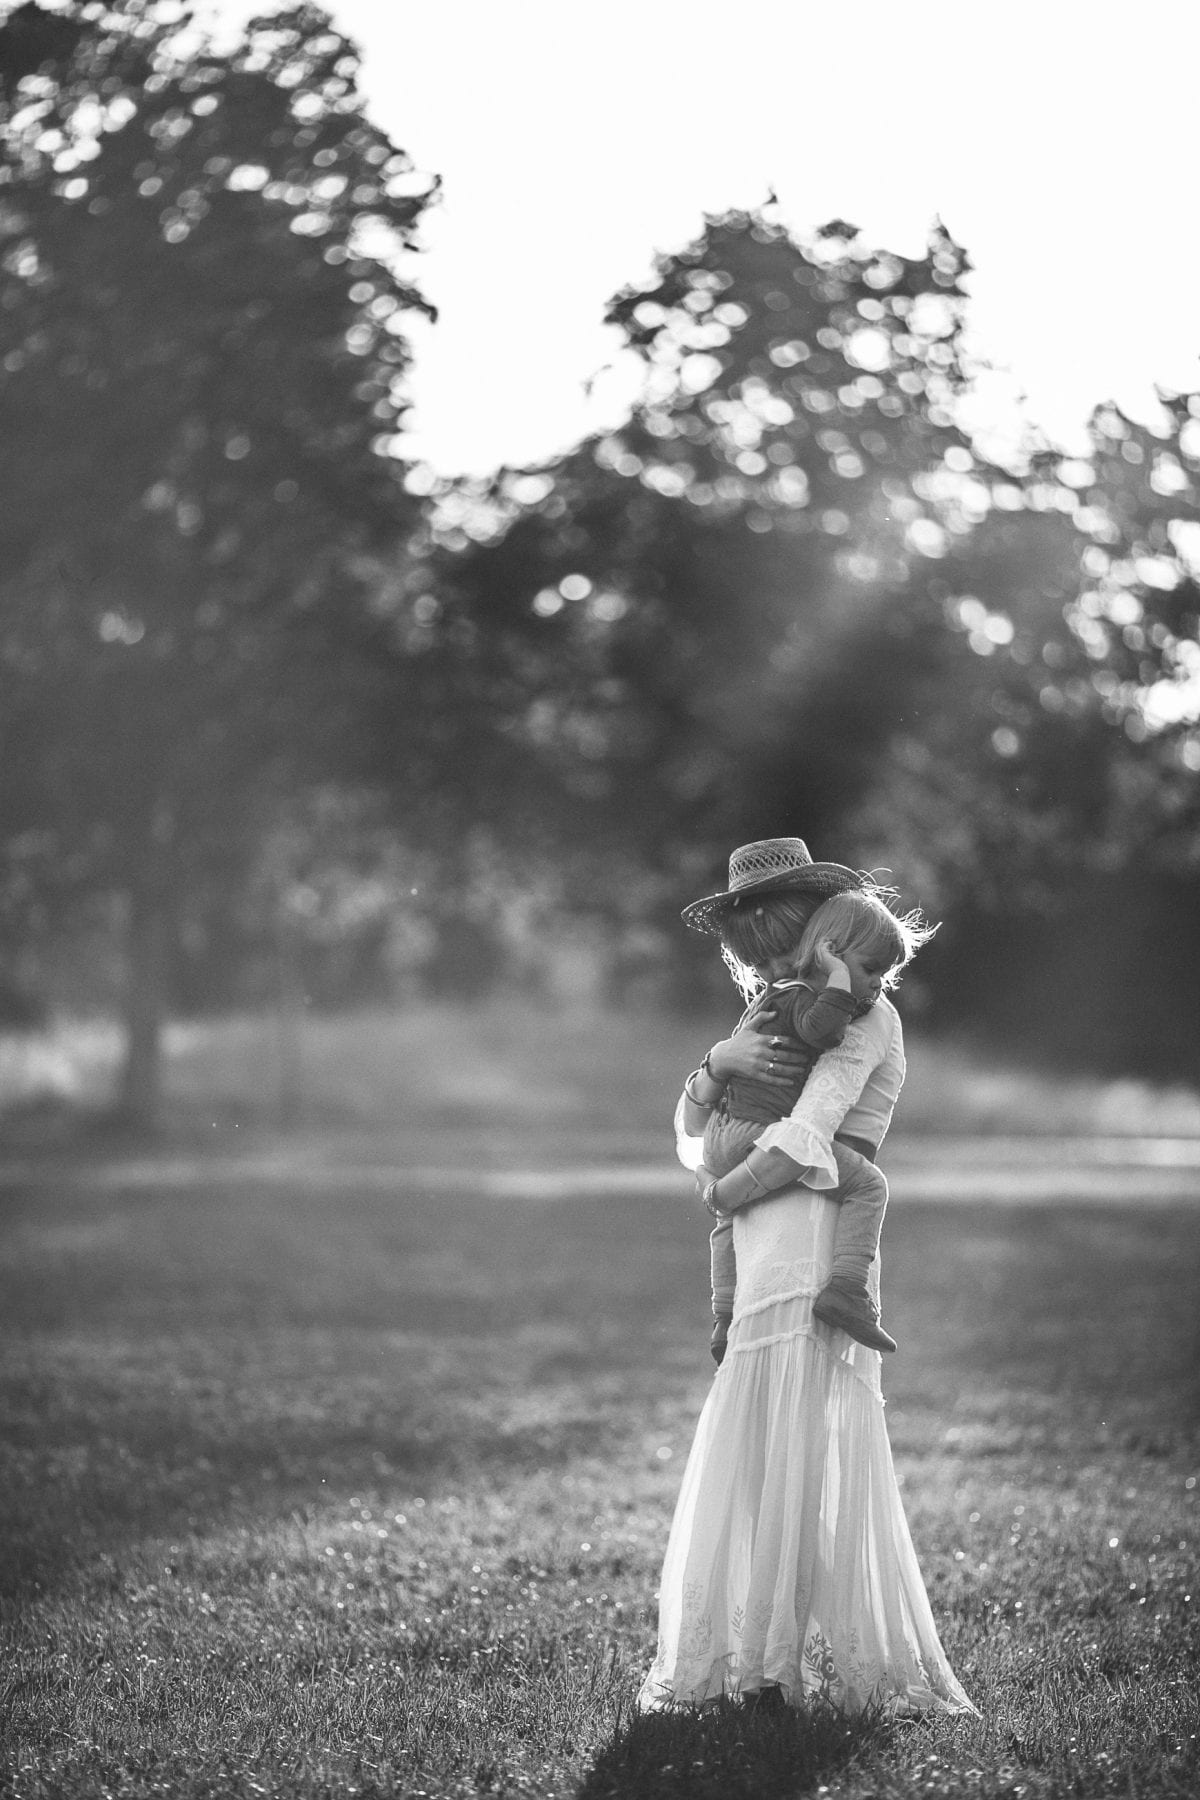 elin_bandmann_photography_wedding_photographer_sweden-37